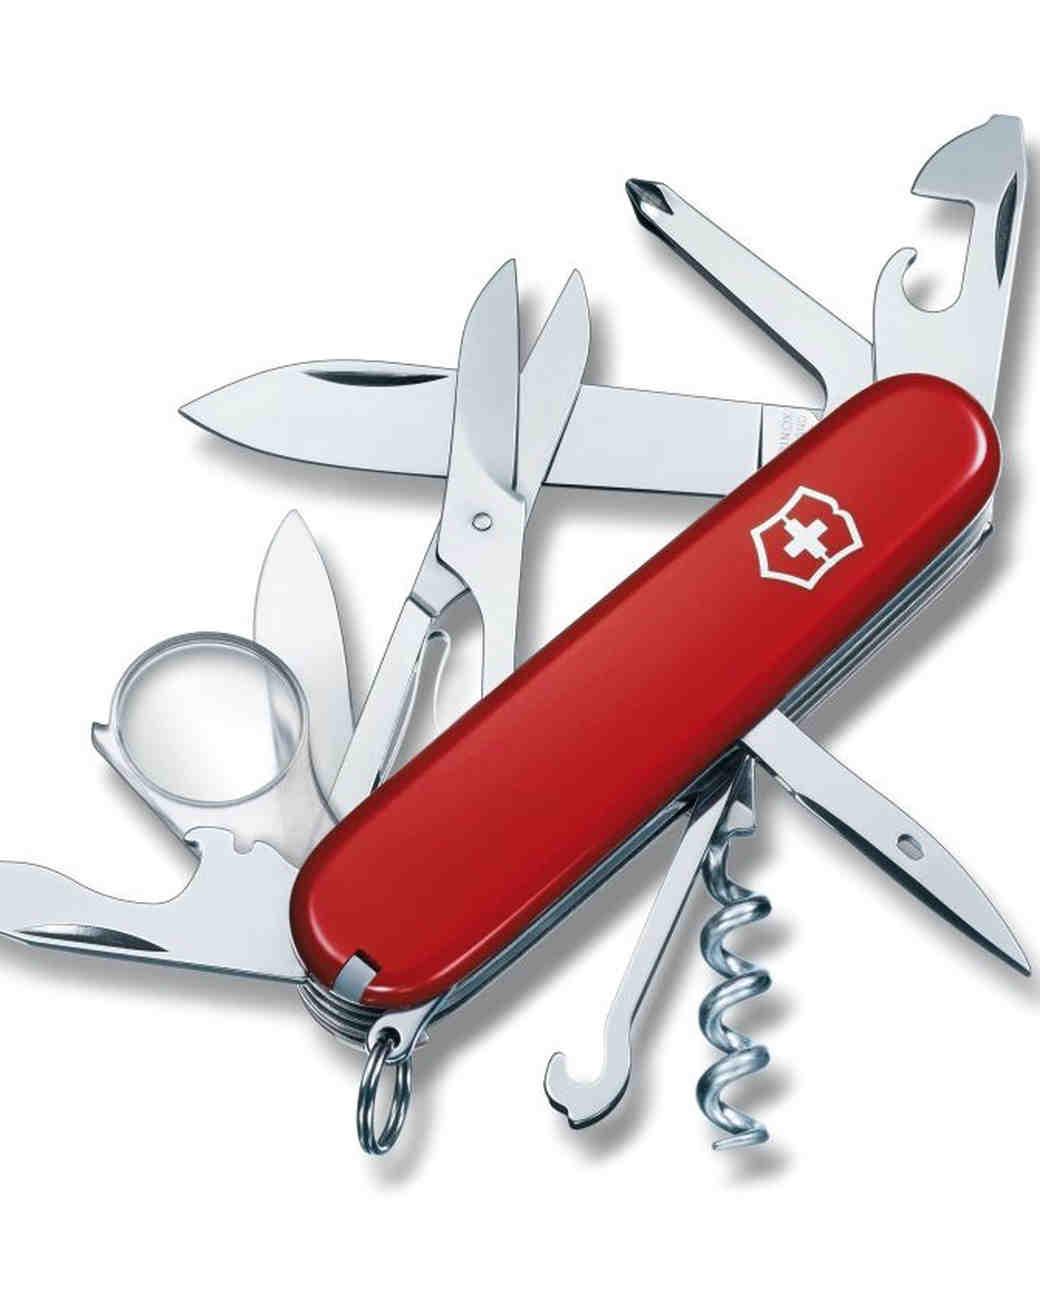 grooms-gift-swiss-army-knife-0616.jpg